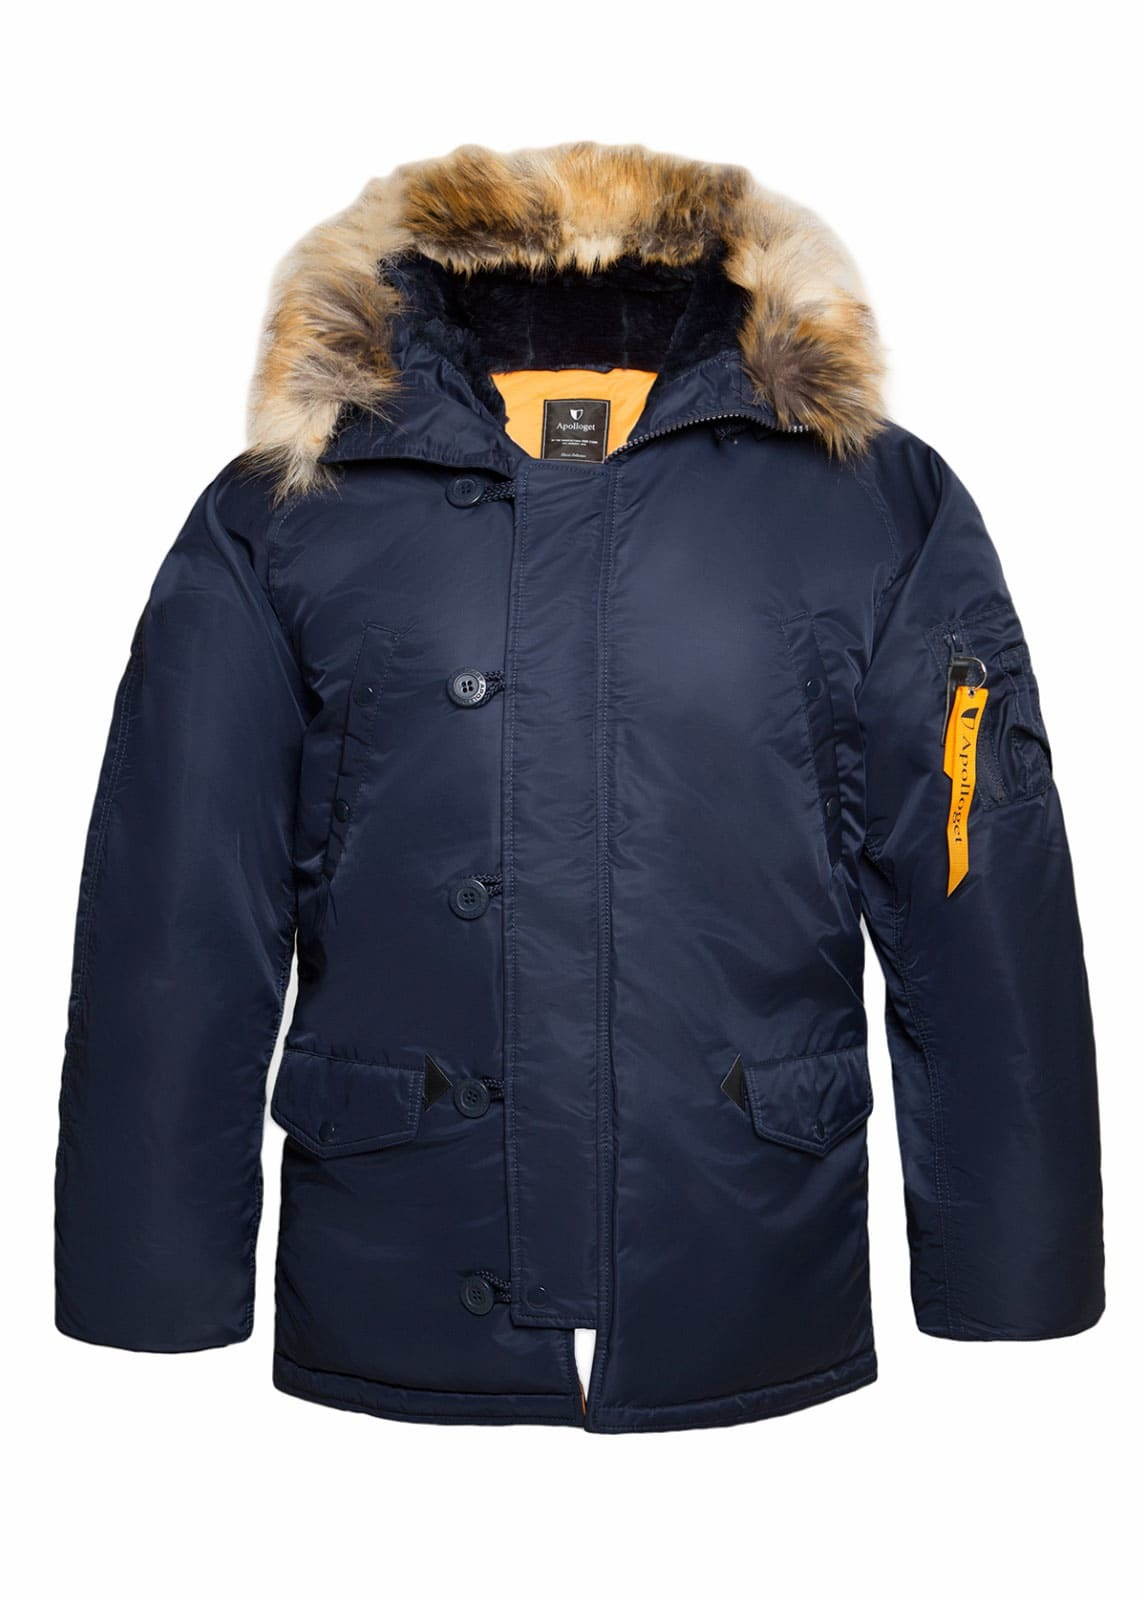 Куртка Аляска  Apolloget N-3B Regular (синяя - r.blue/orange)